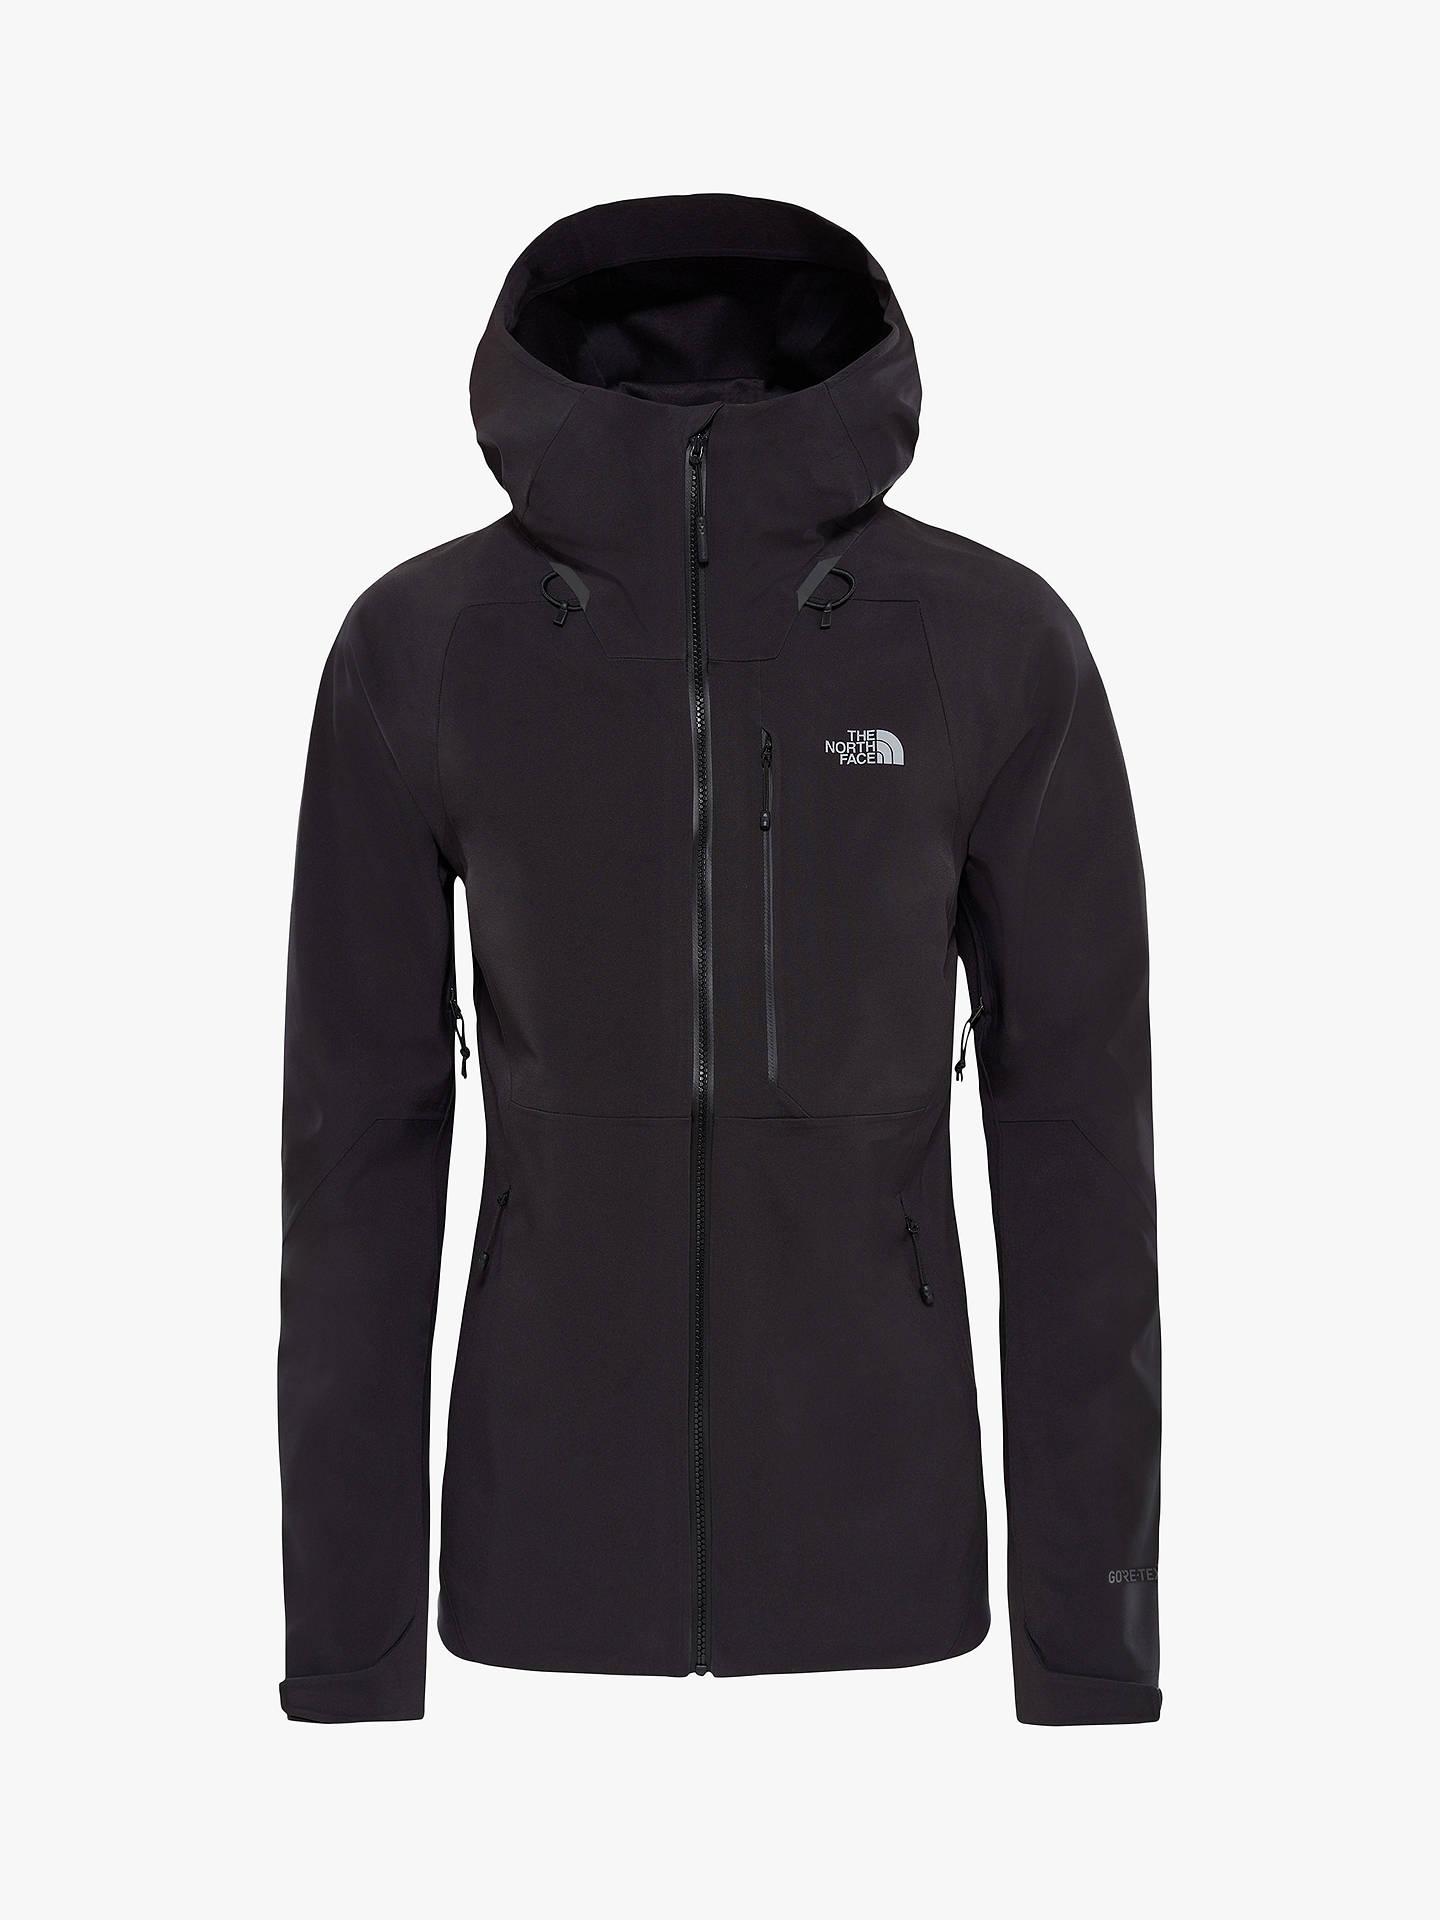 BuyThe North Face Apex Flex GTX 2.0 Women s Waterproof Jacket 92f090192